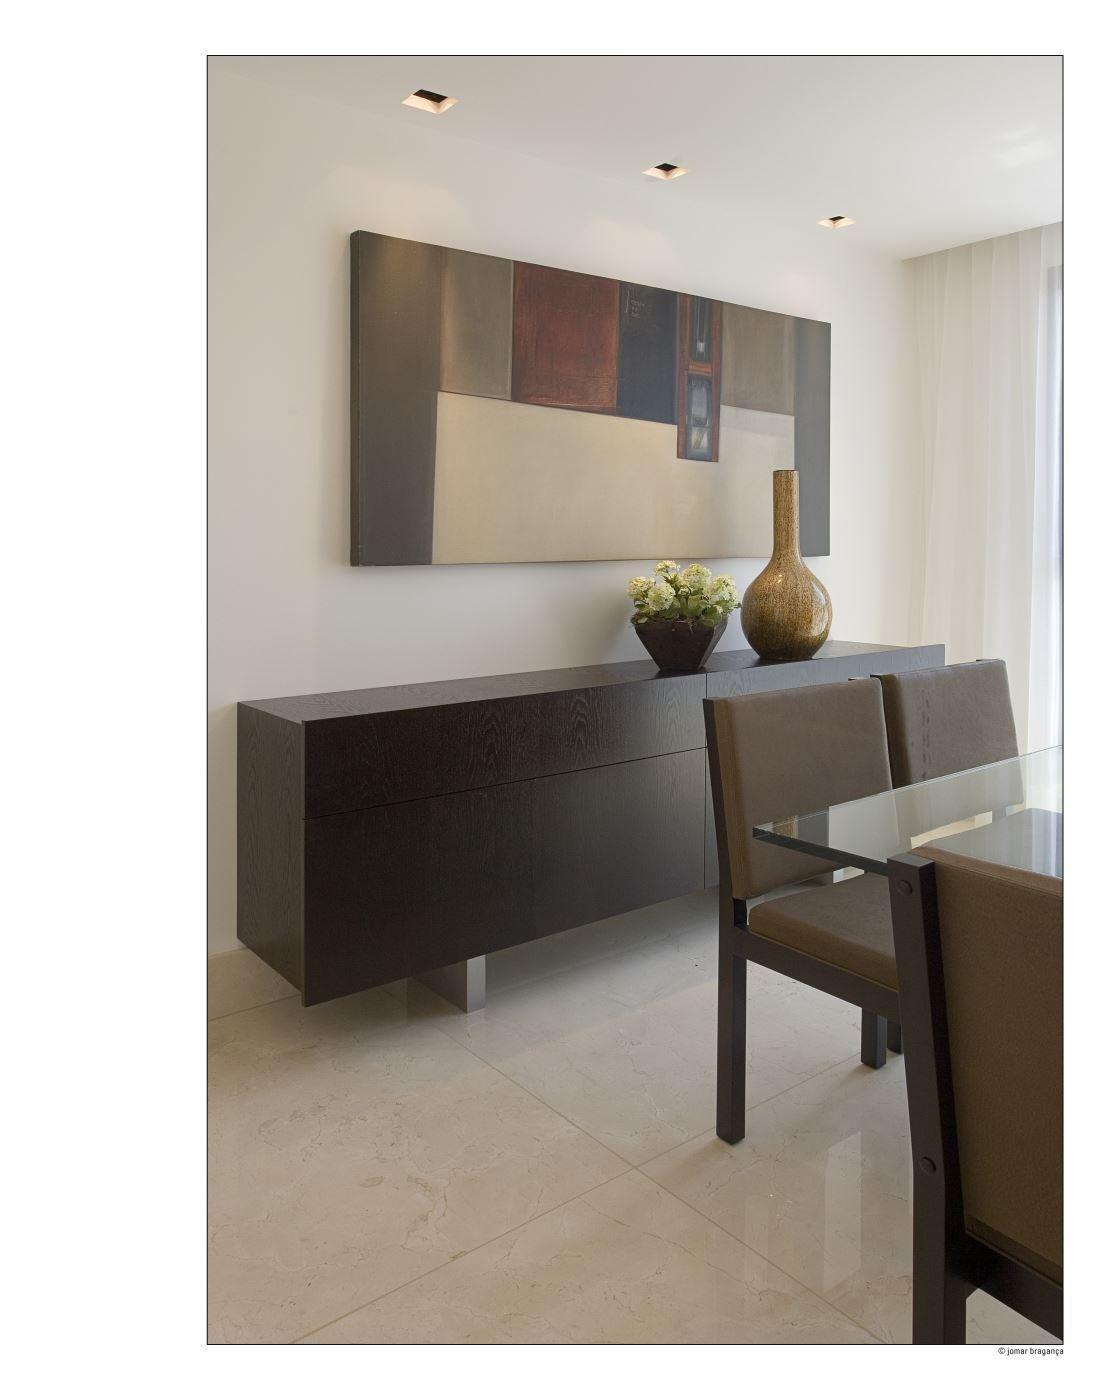 Aparador De Madeira E Quadro Abstrato De Gislene Lopes 70324 No  -> Quadro Abstrato Sala De Jantar